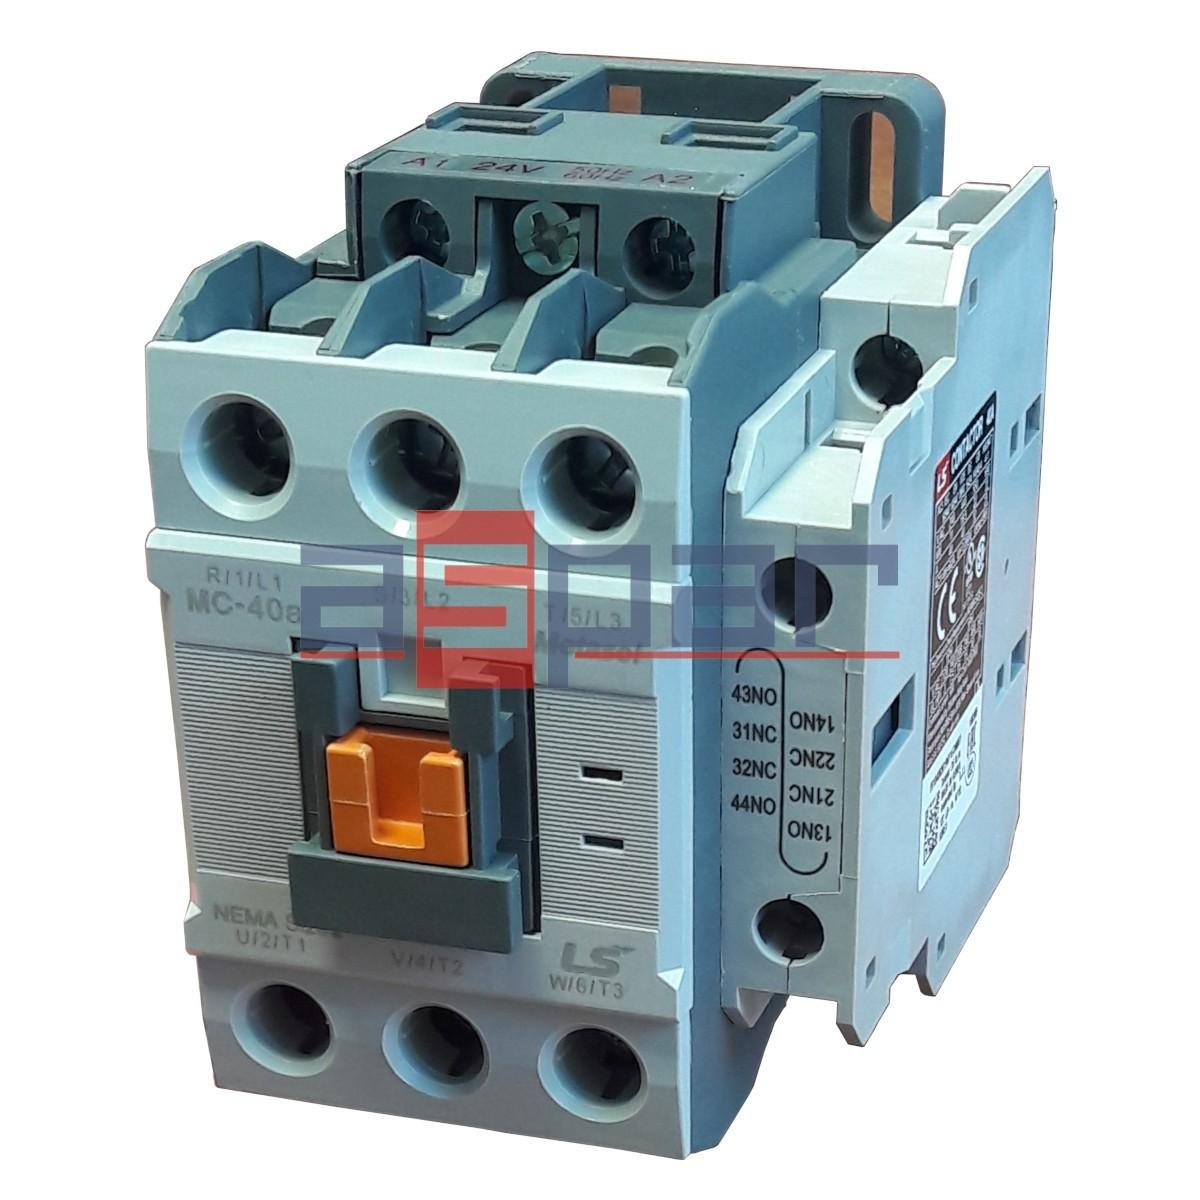 Stycznik. METASOL. Contactor. LSIS.LG. LS.MC-40A 1a1b 230VAC. MC40a. MC-40A 230VAC. MC-40A